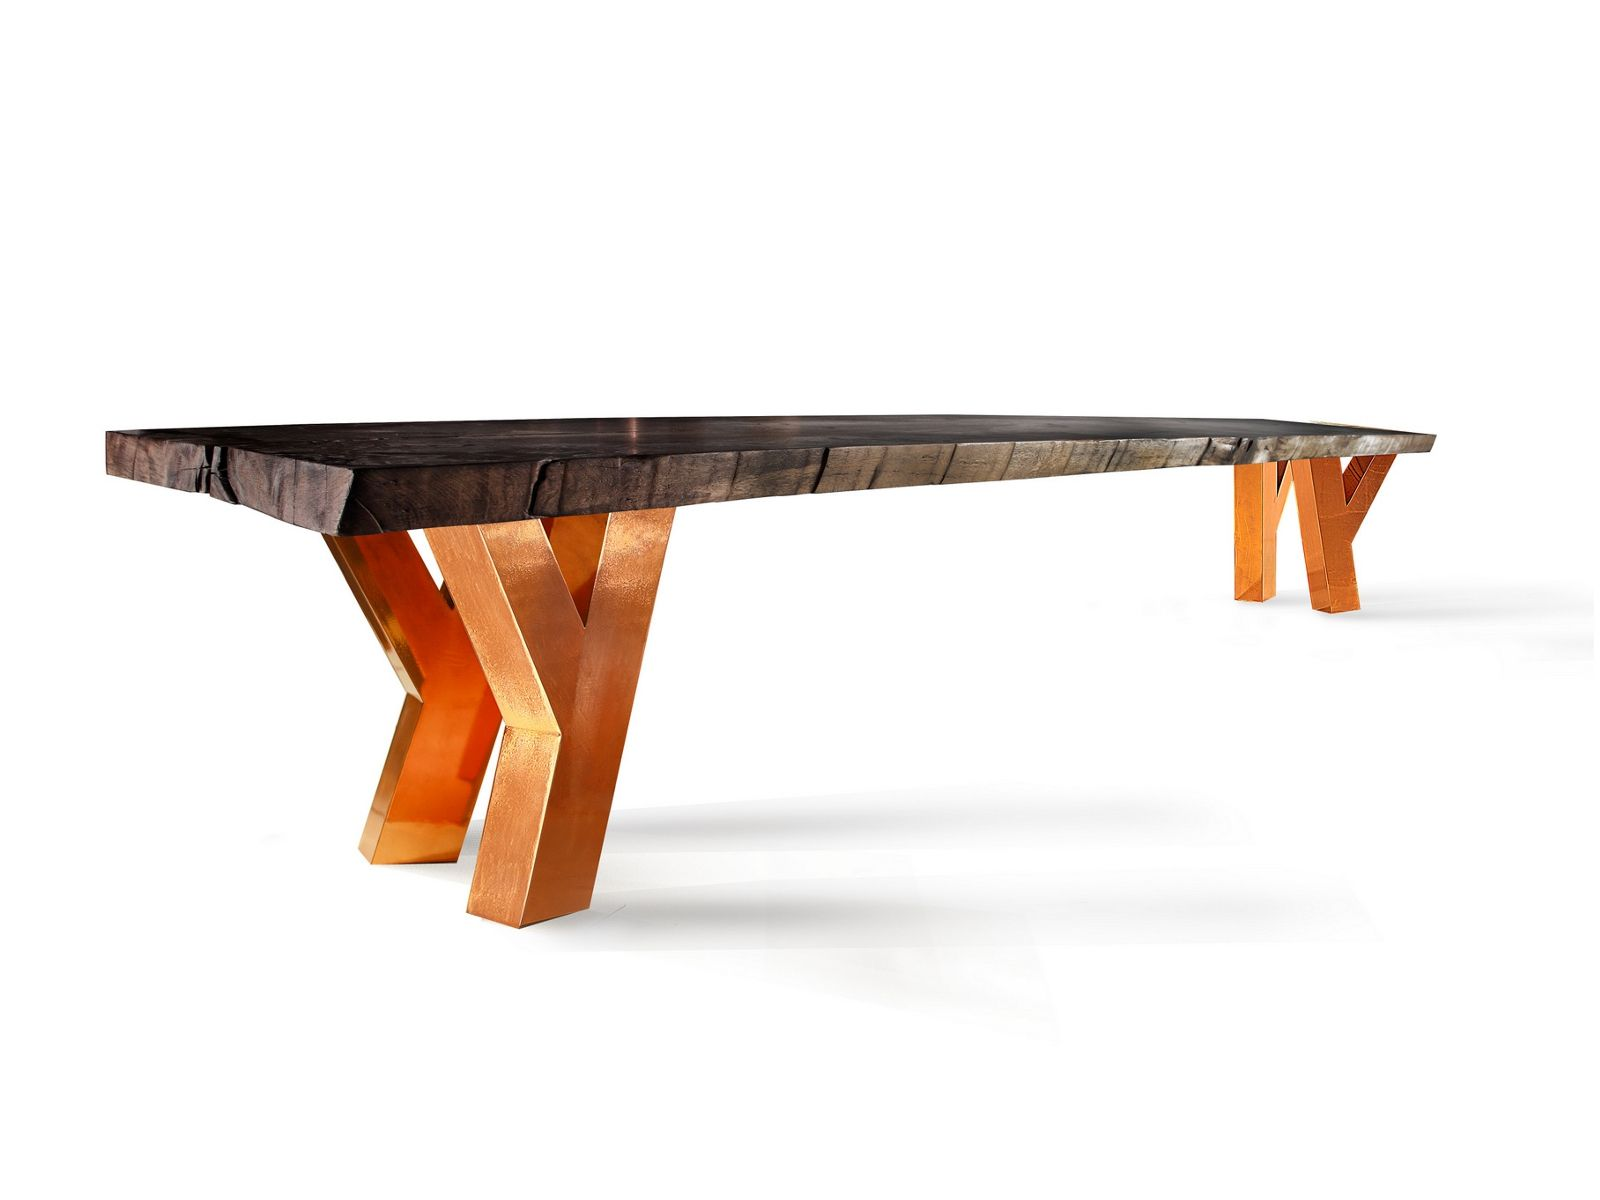 Inspirant Table Basse Plexiglas